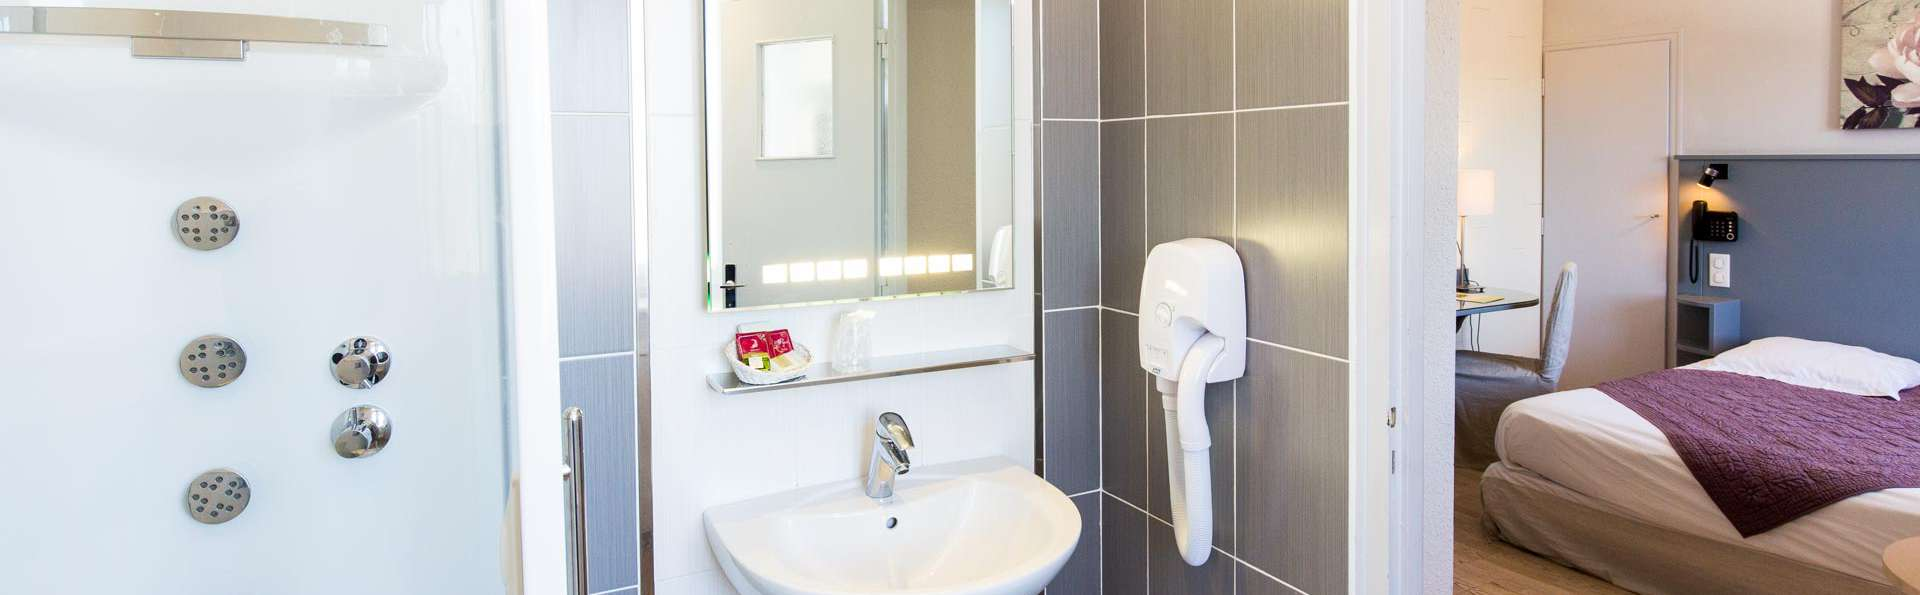 Hôtel Beau Site - Luxeuil-les-Bains - EDIT_NEW_BATHROOM_01.jpg